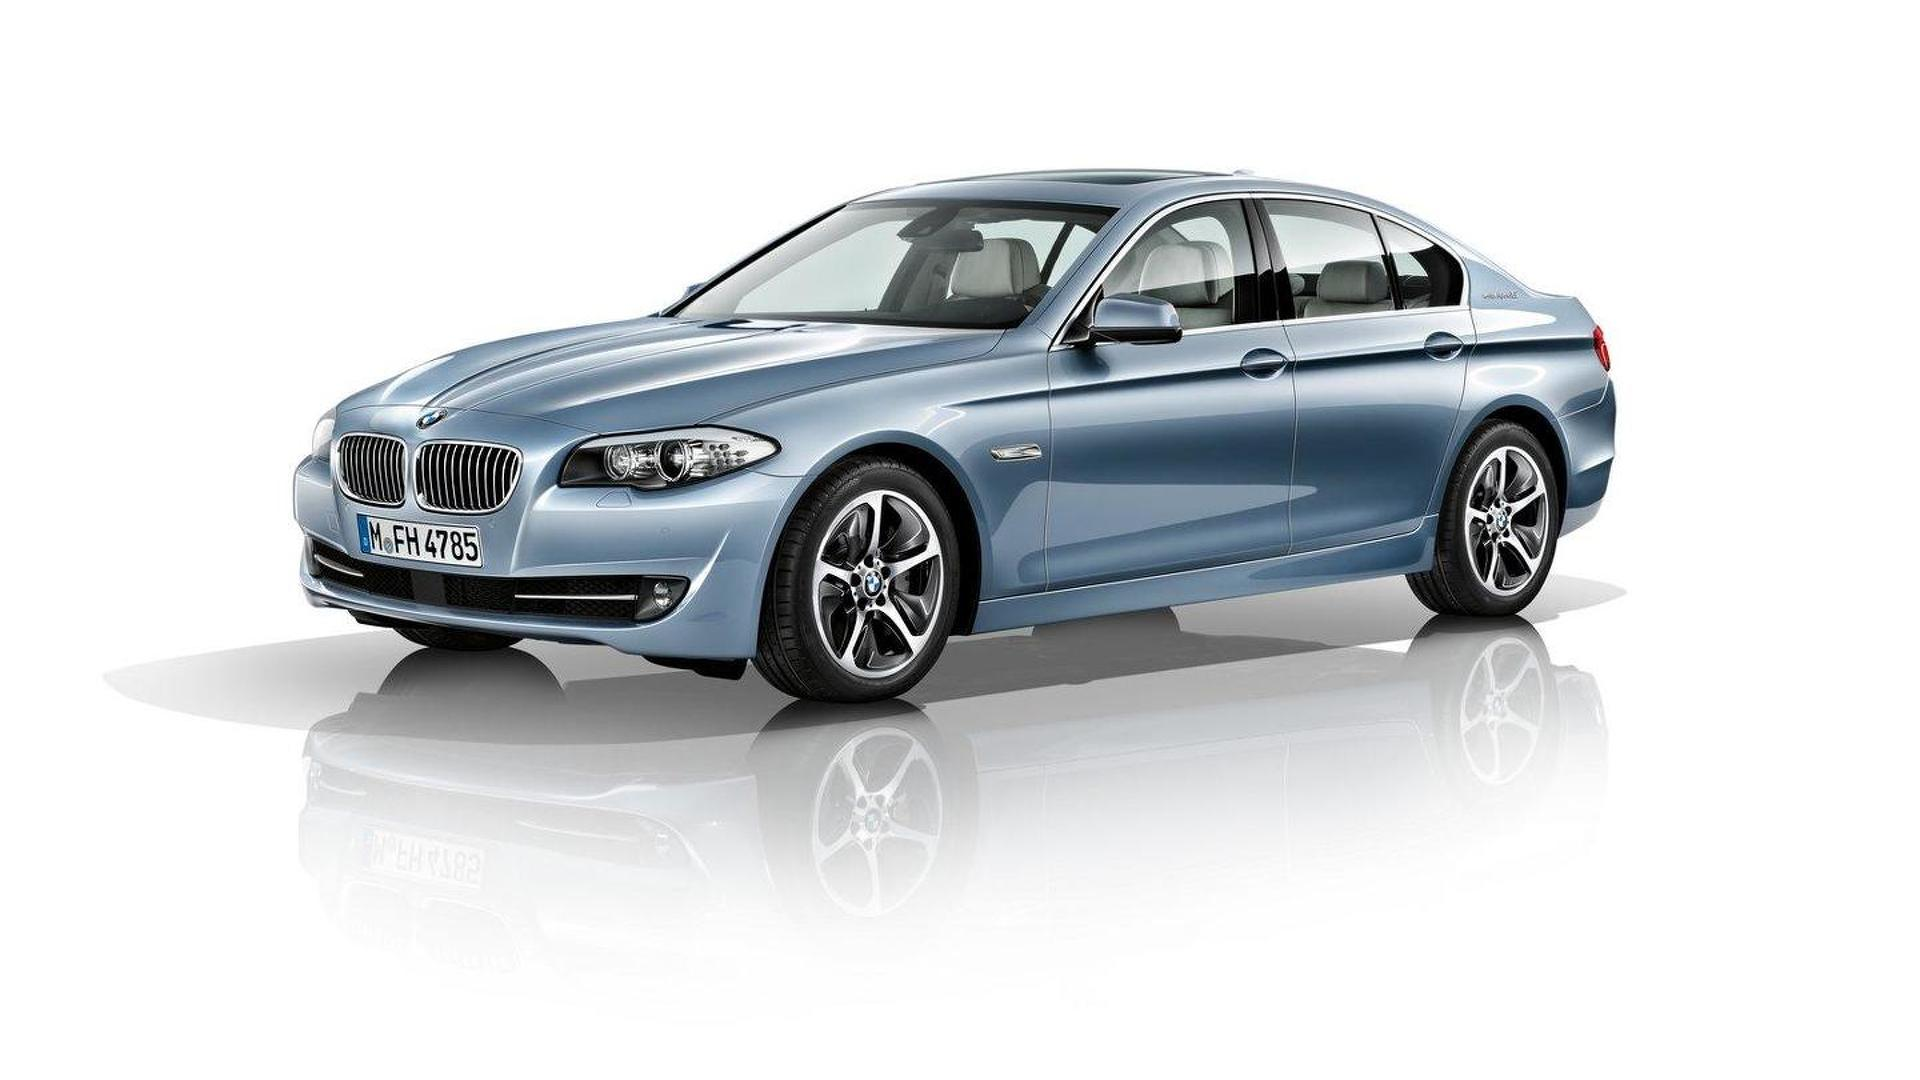 2012 BMW 5-Series Active Hybrid 5